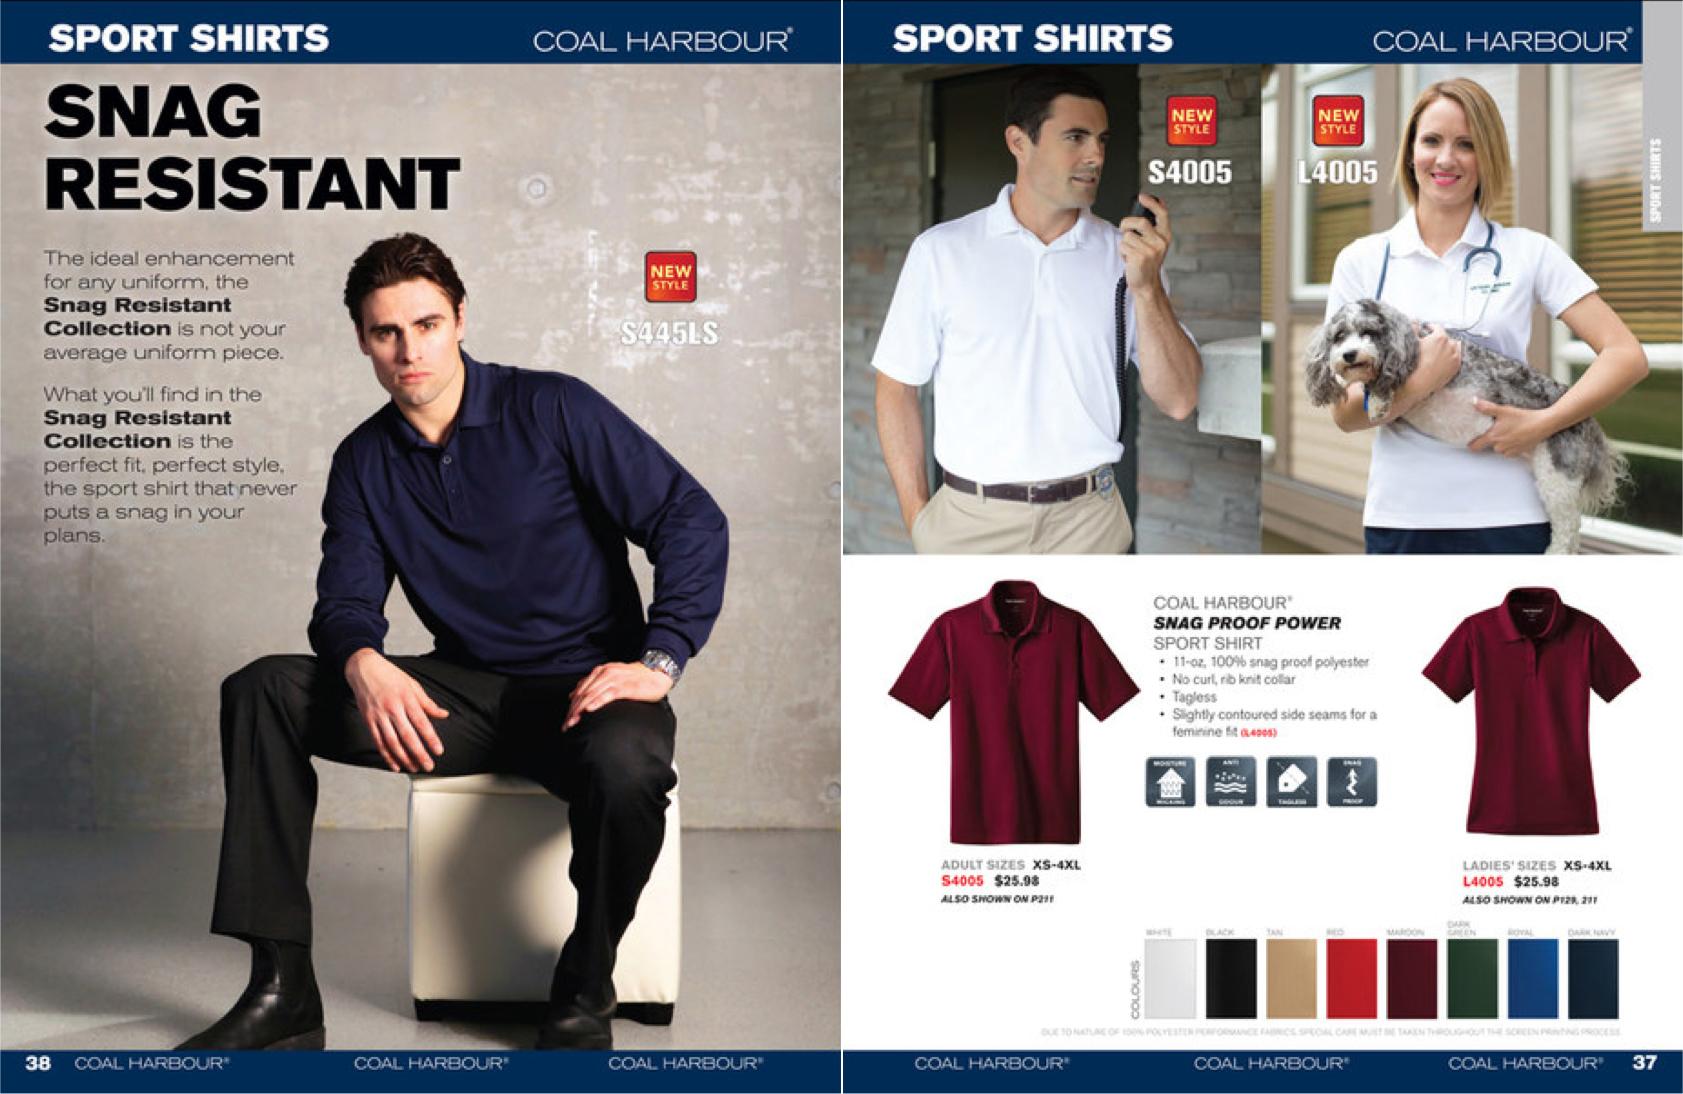 sport shirts web edit.jpg